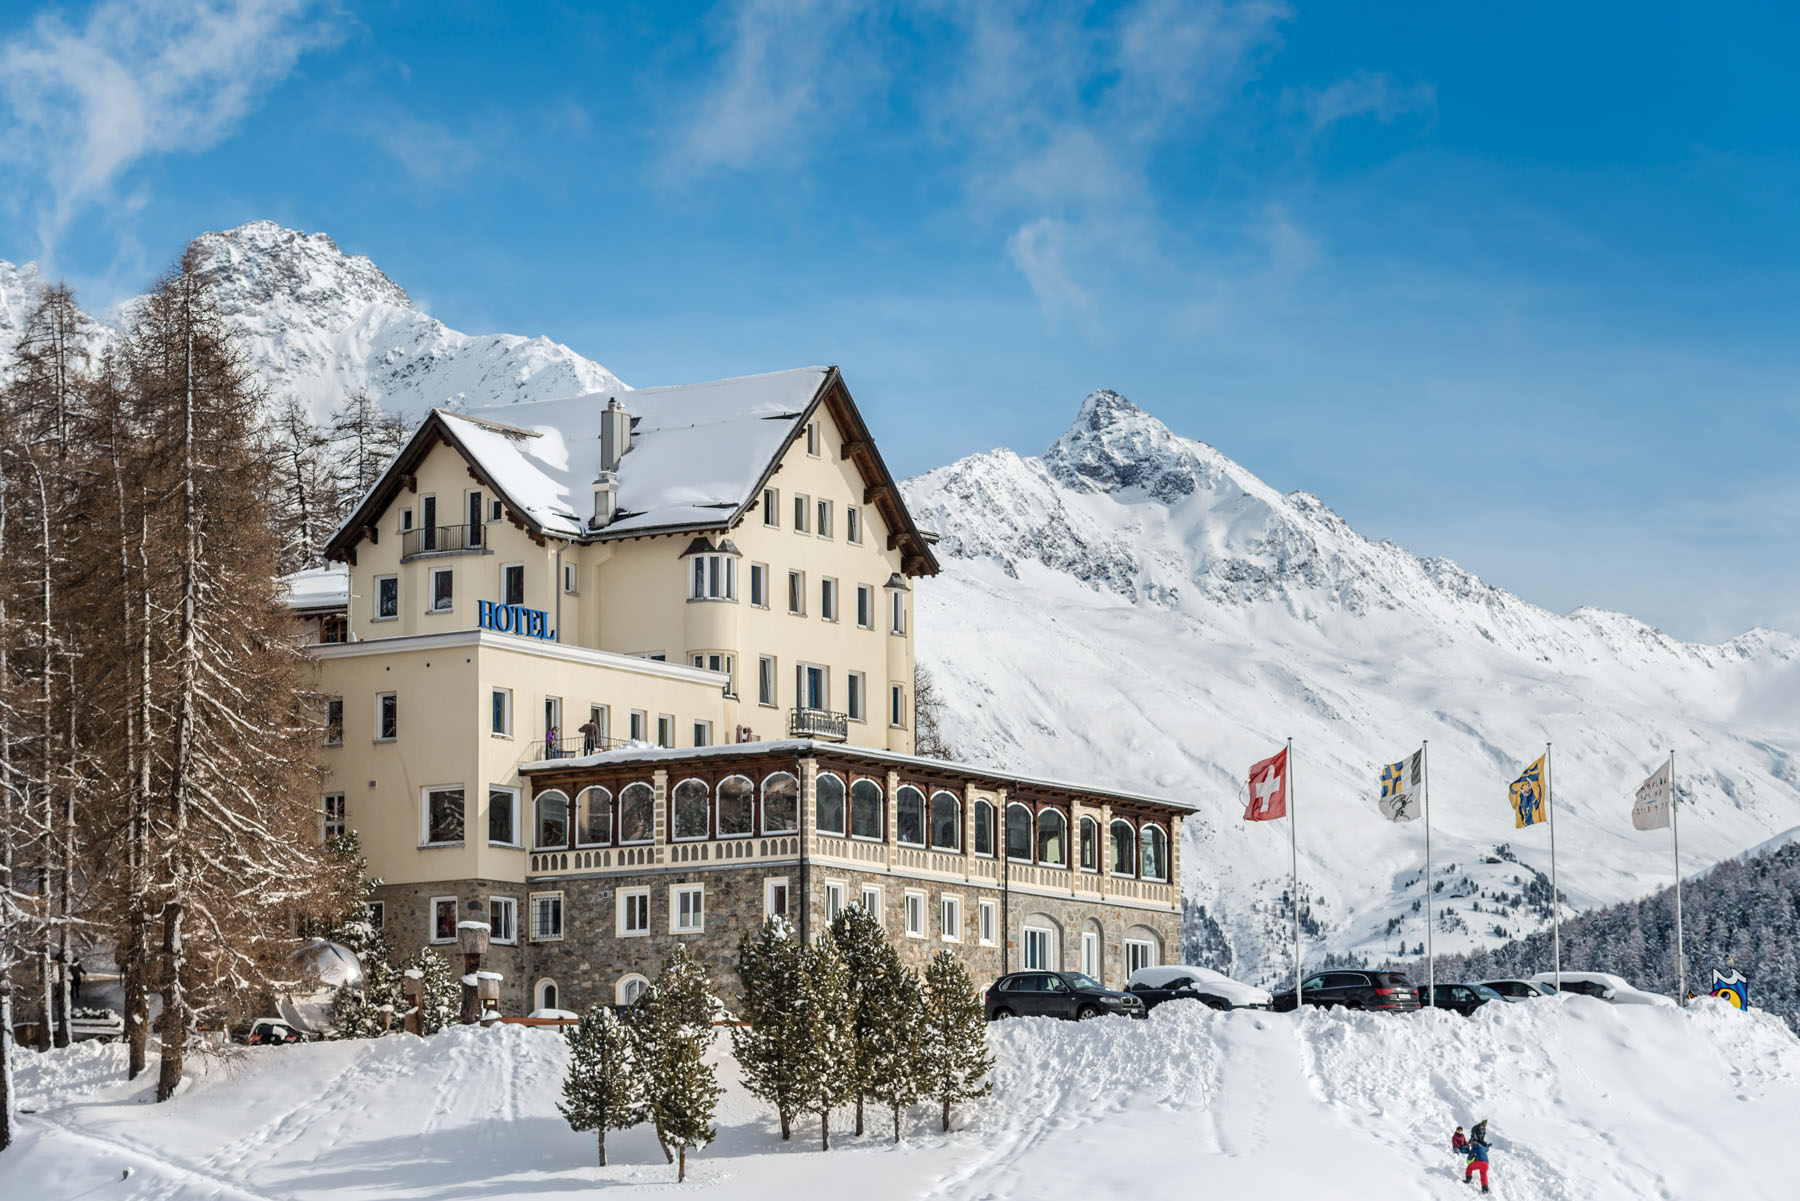 Switzerland-St. Moritz_388348897_1